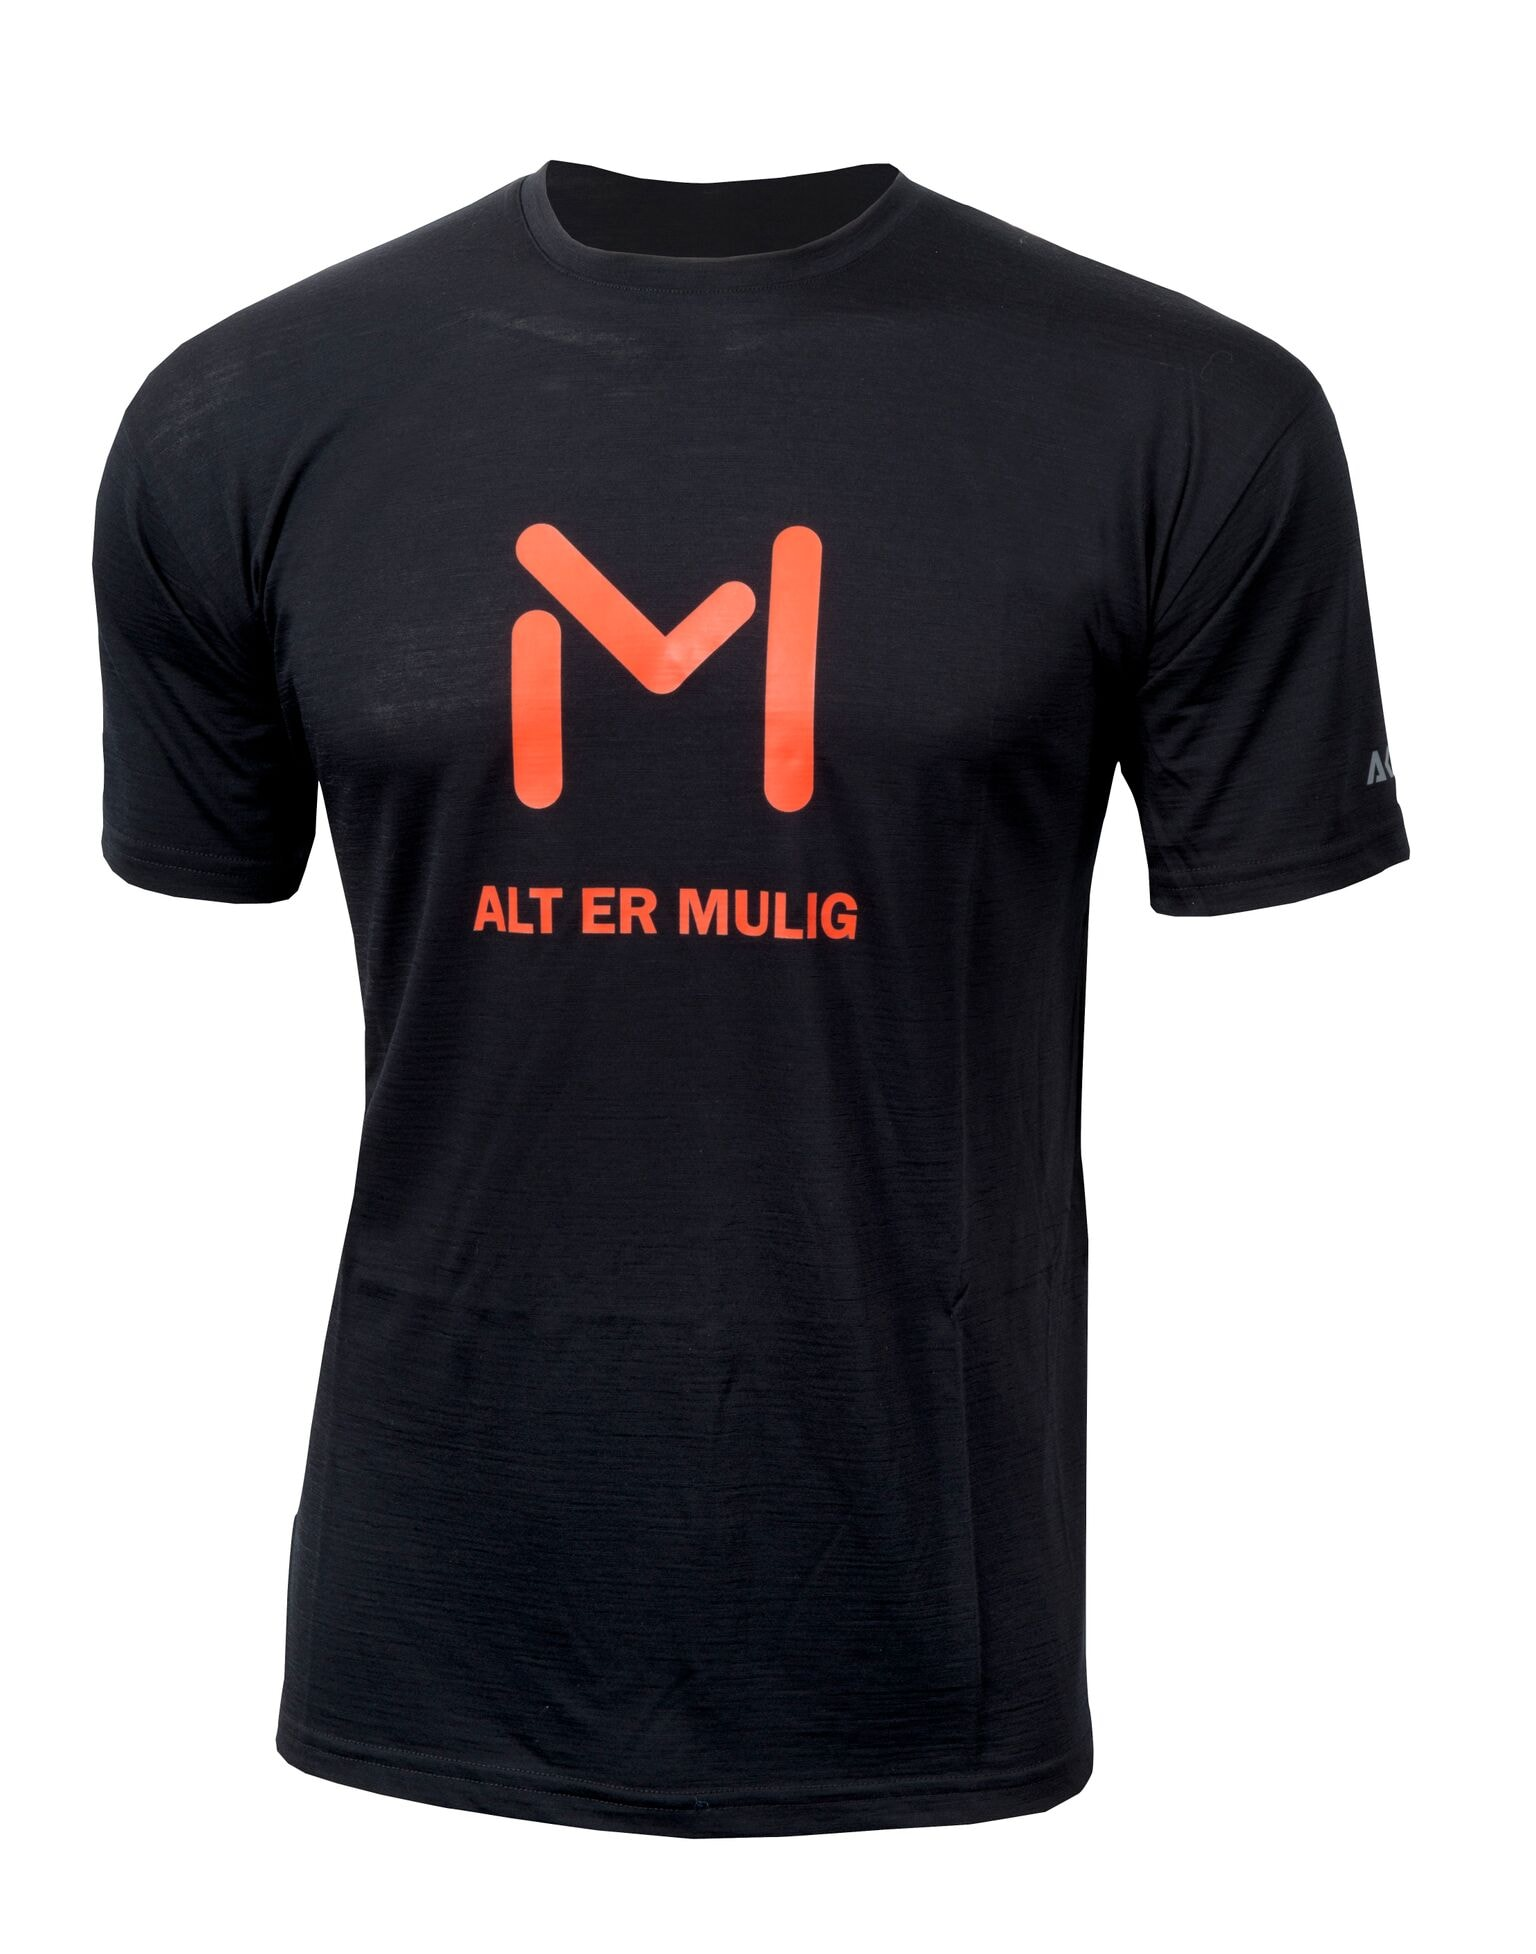 Aclima LM Anàrjohka T-shirt